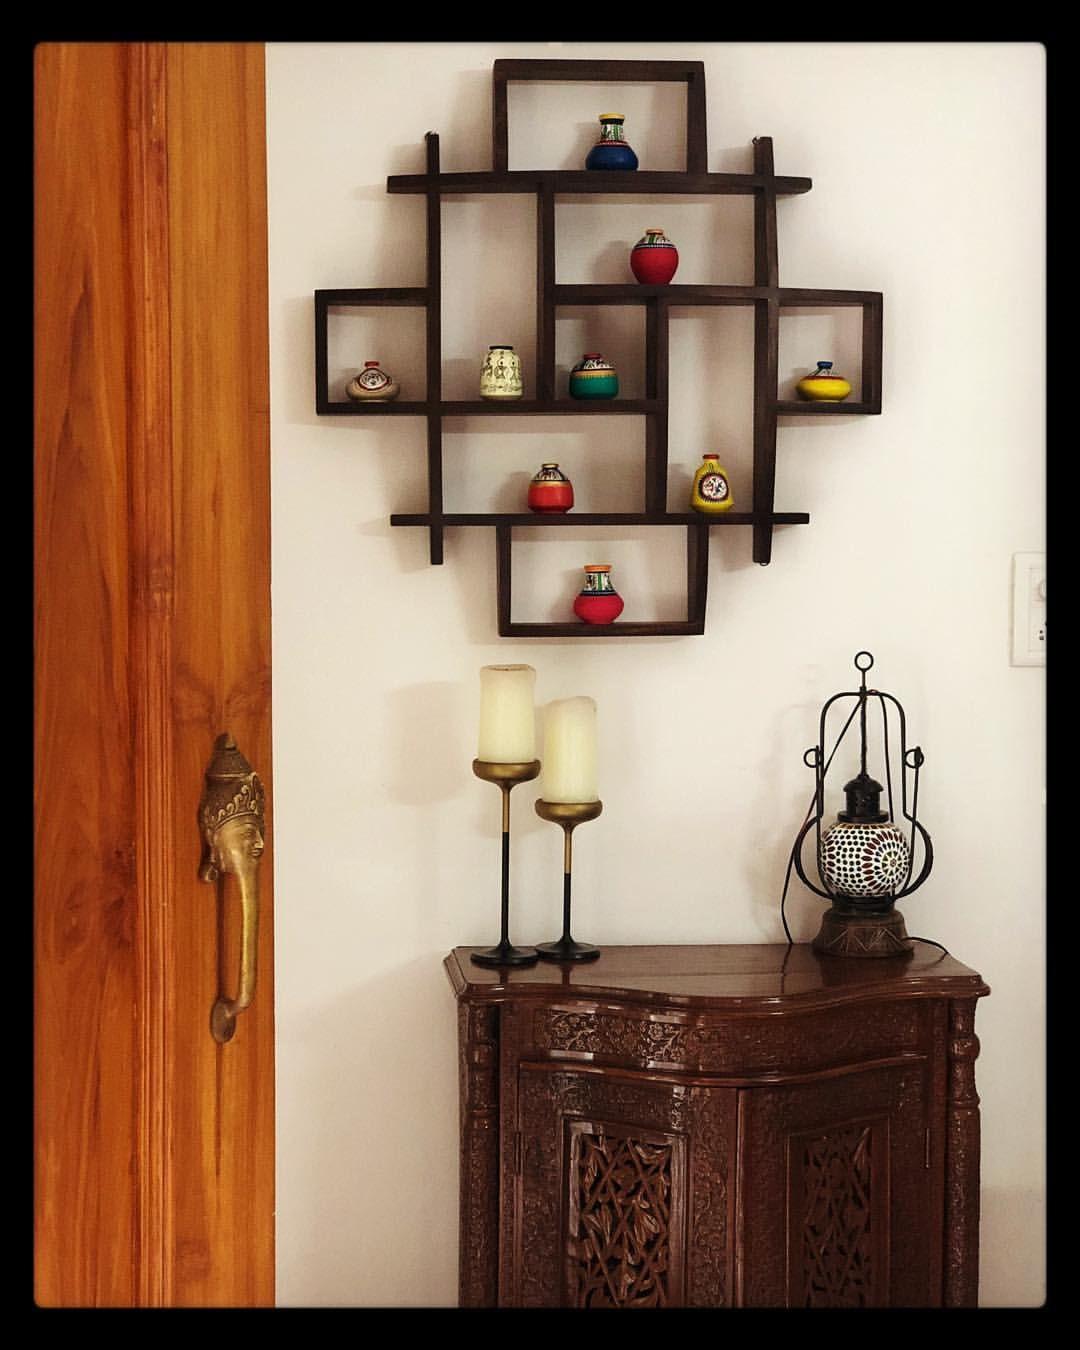 These corners hathkargha home jabalpur madhyapradesh also best images in rh pinterest